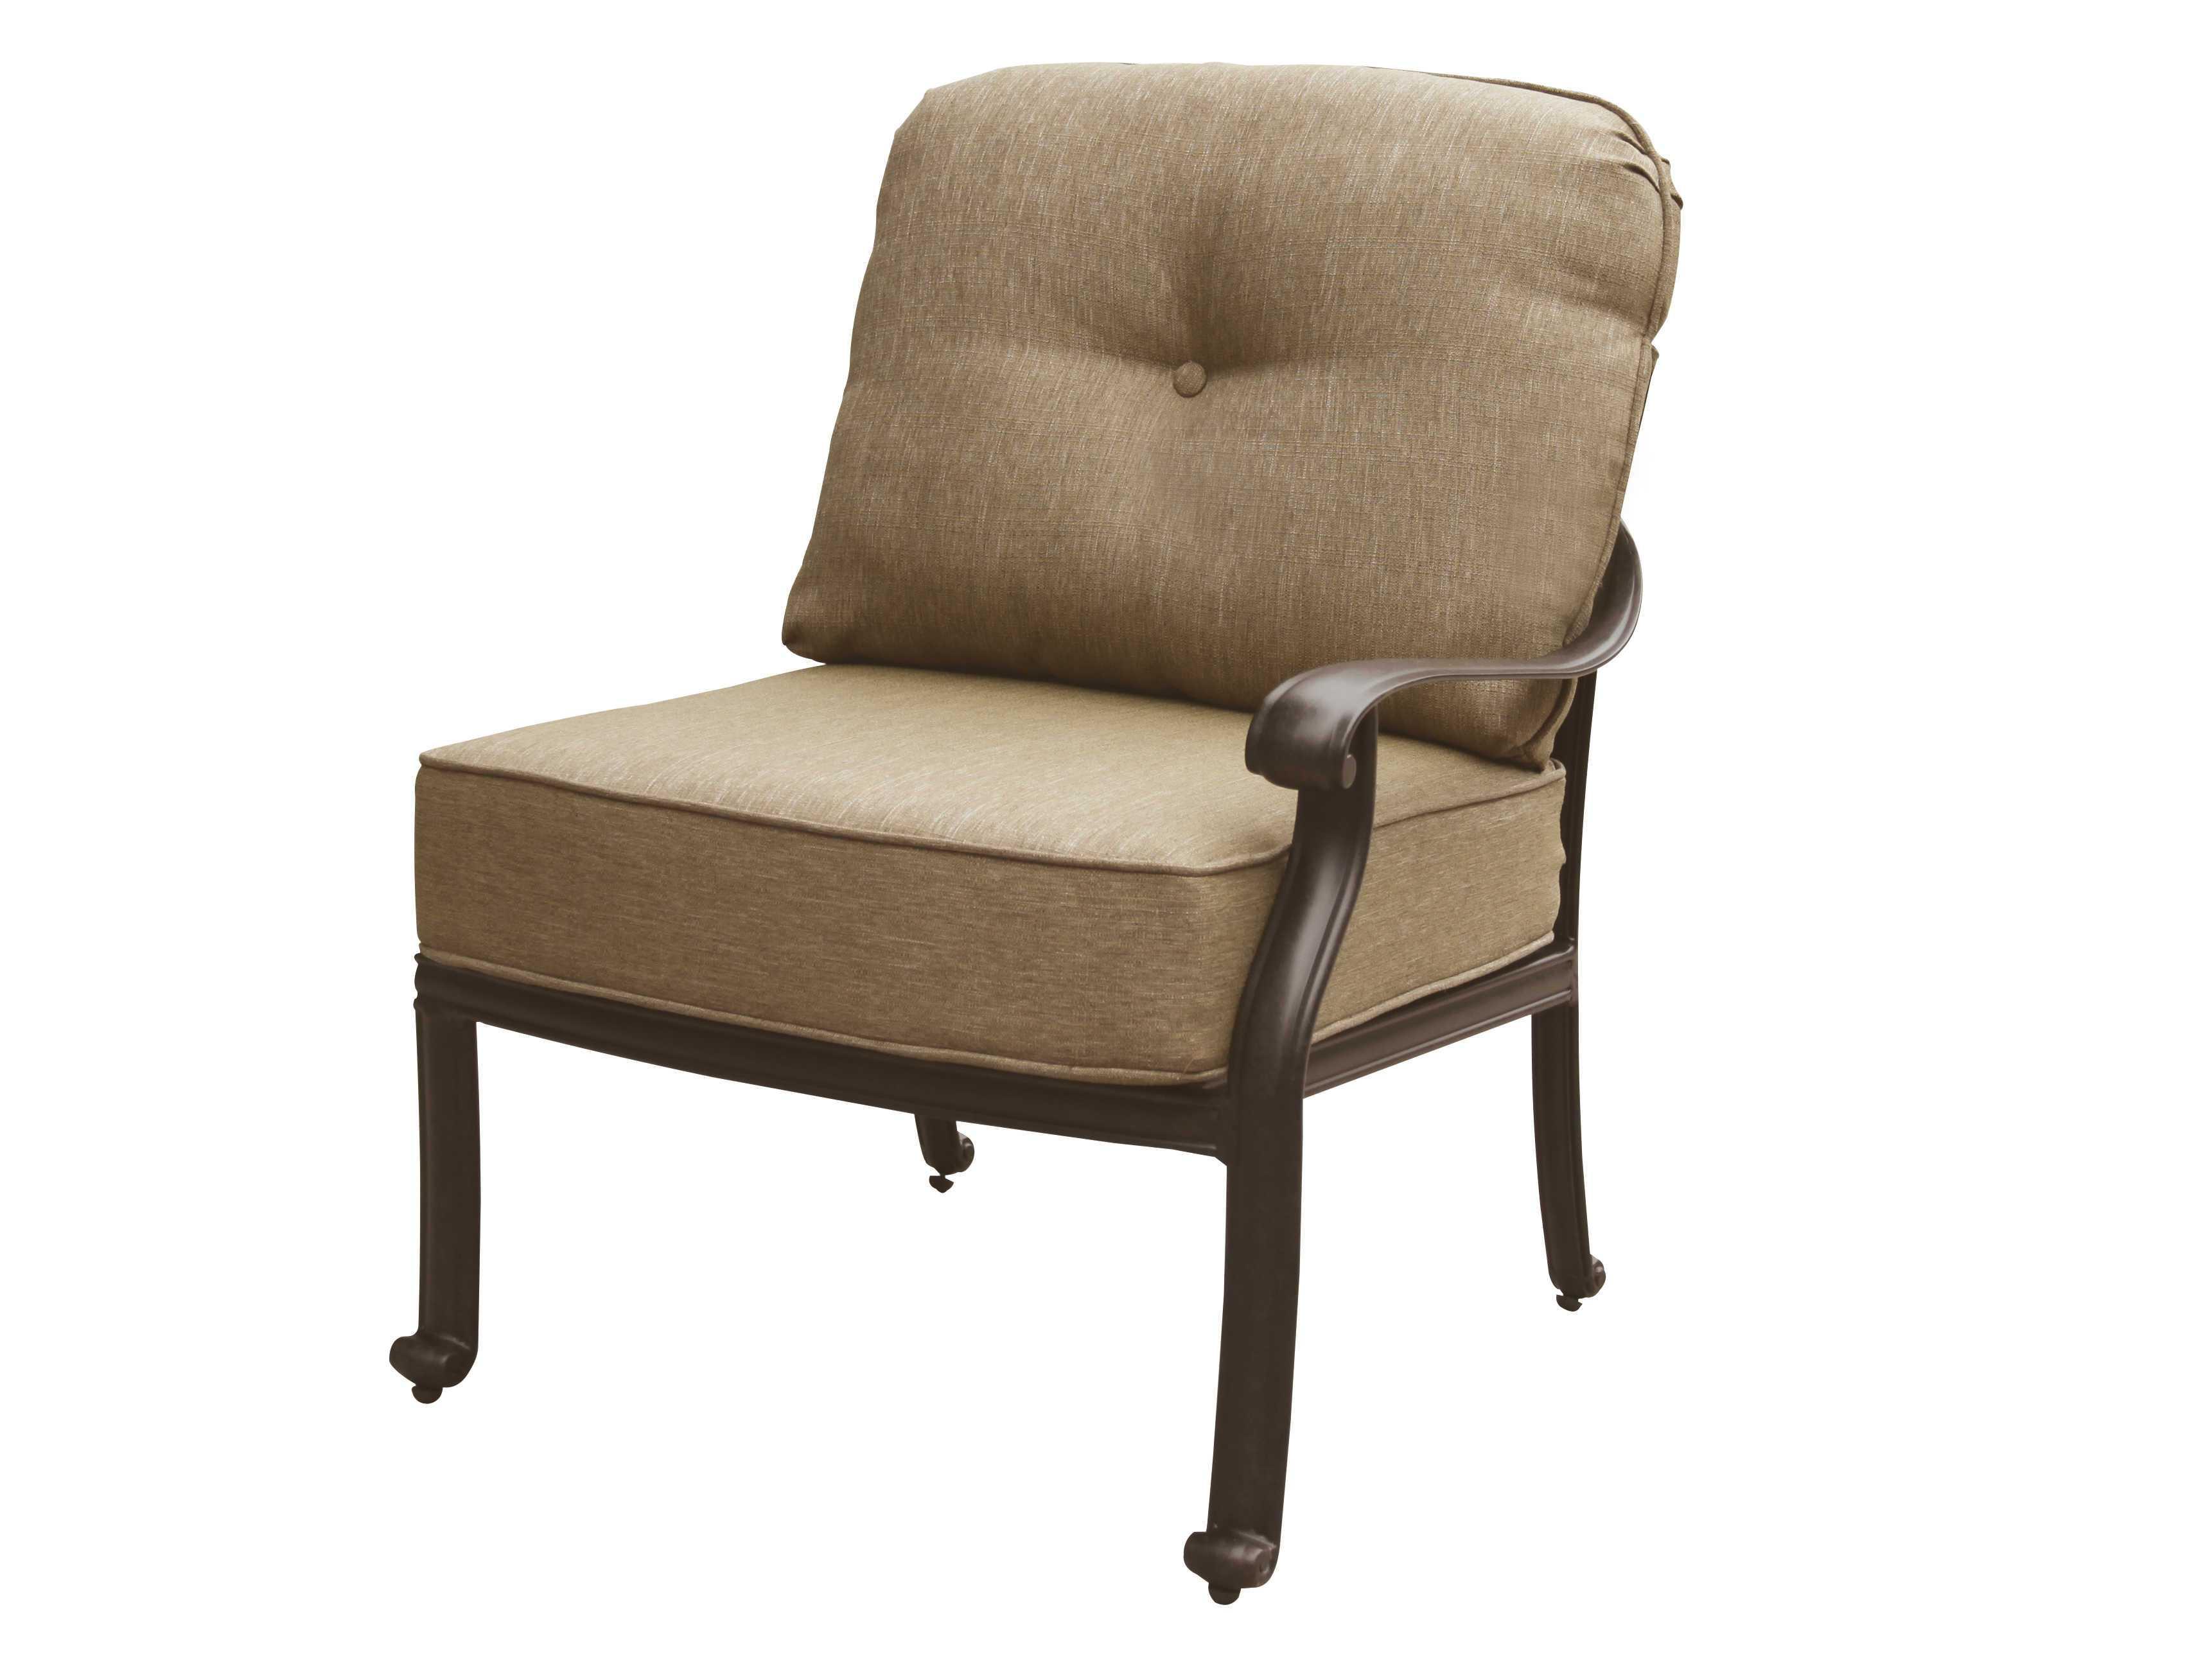 Awe Inspiring Darlee Outdoor Living Standard Elisabeth Cast Aluminum Antique Bronze Sectional Right Facing Arm Chair Home Interior And Landscaping Mentranervesignezvosmurscom